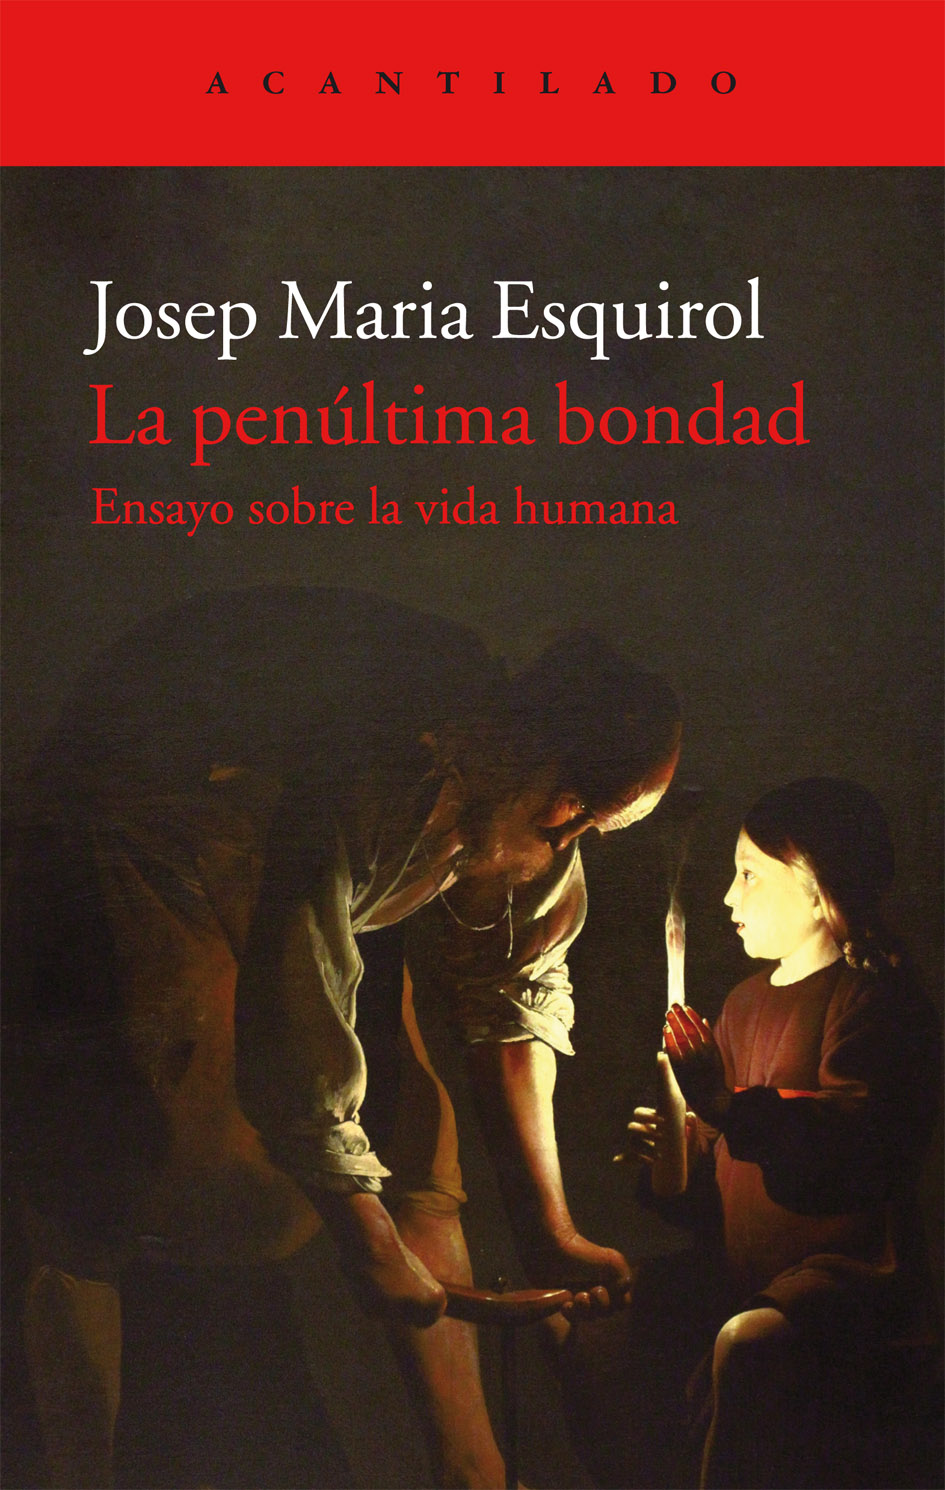 La penúltima bondad, de Josep Maria Esquirol